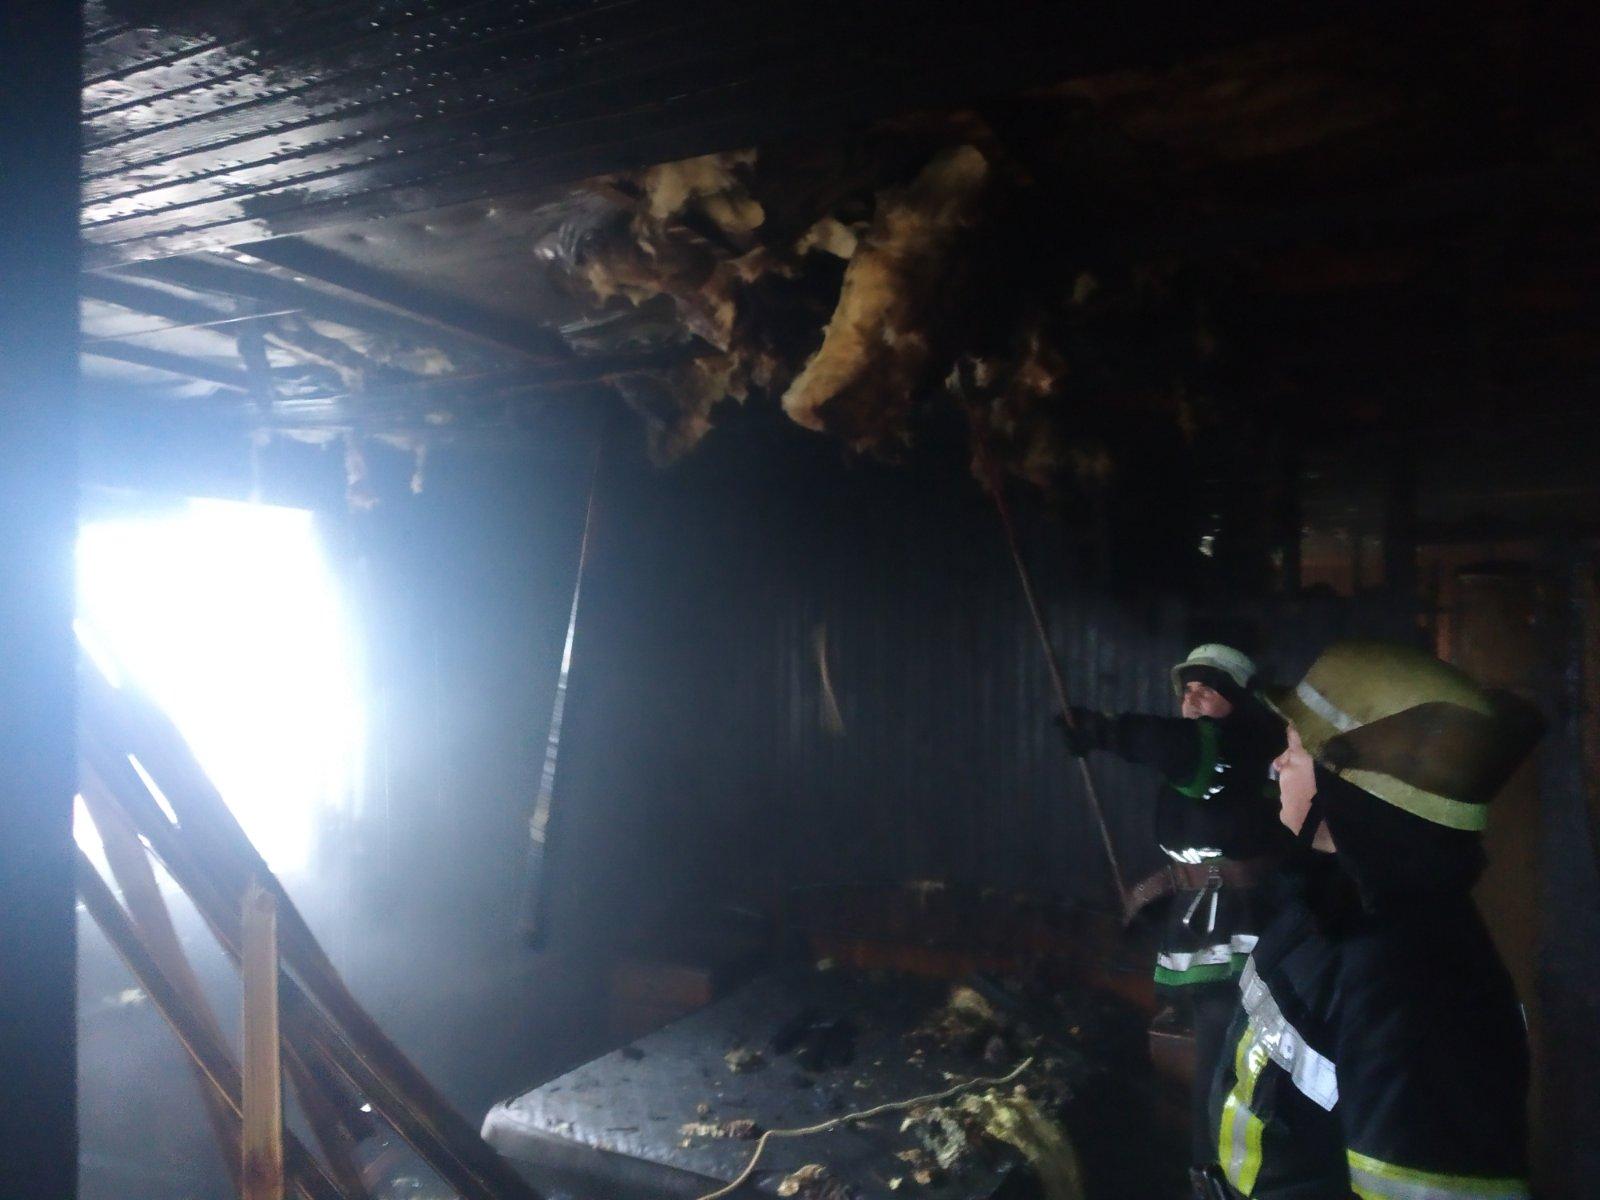 У Борисполі горіла лазня -  - yzobrazhenye viber 2020 01 29 12 00 46